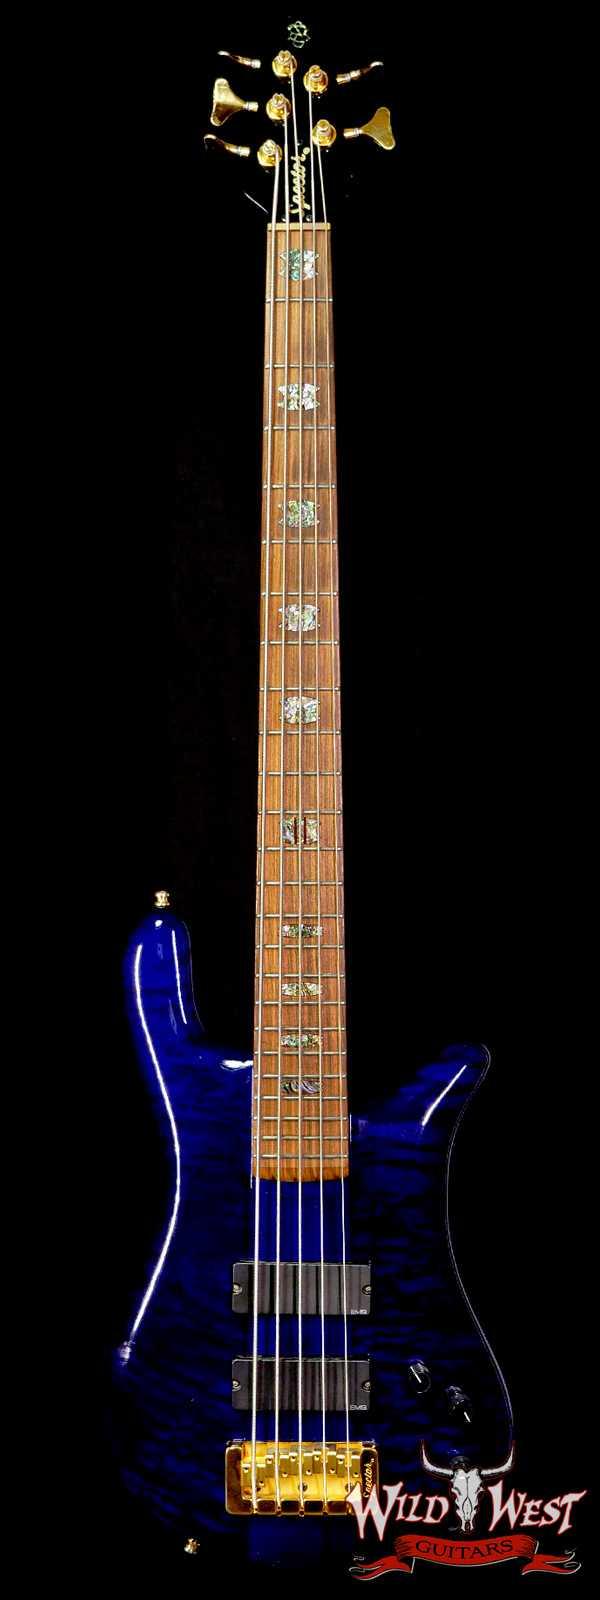 Spector USA NS-5XL #020 5-String Bass Guitar Trans Blue EMG Pickups Aug 20th 1999